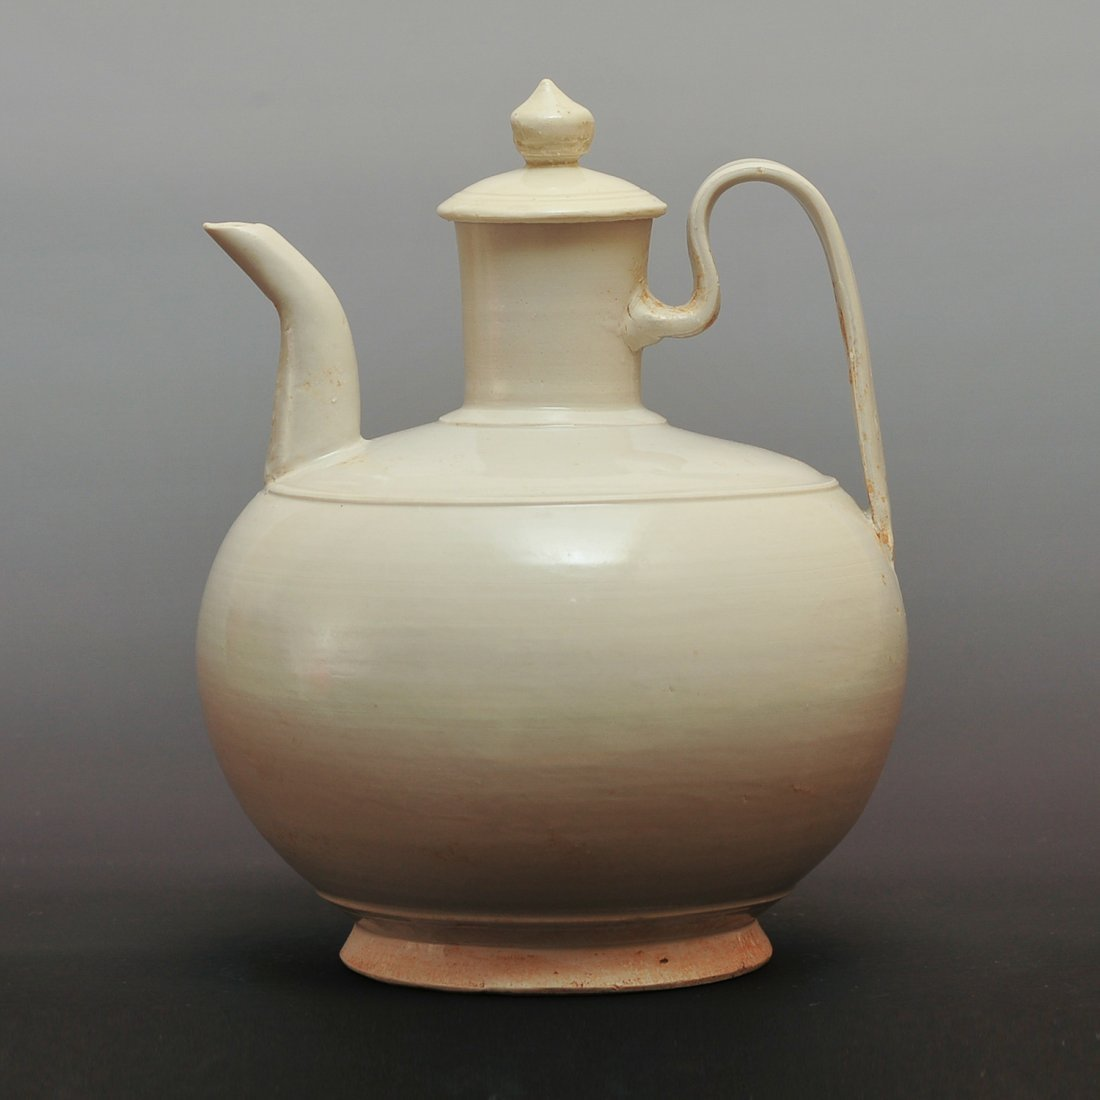 Song Dynasty, A Huozhou ware ewer